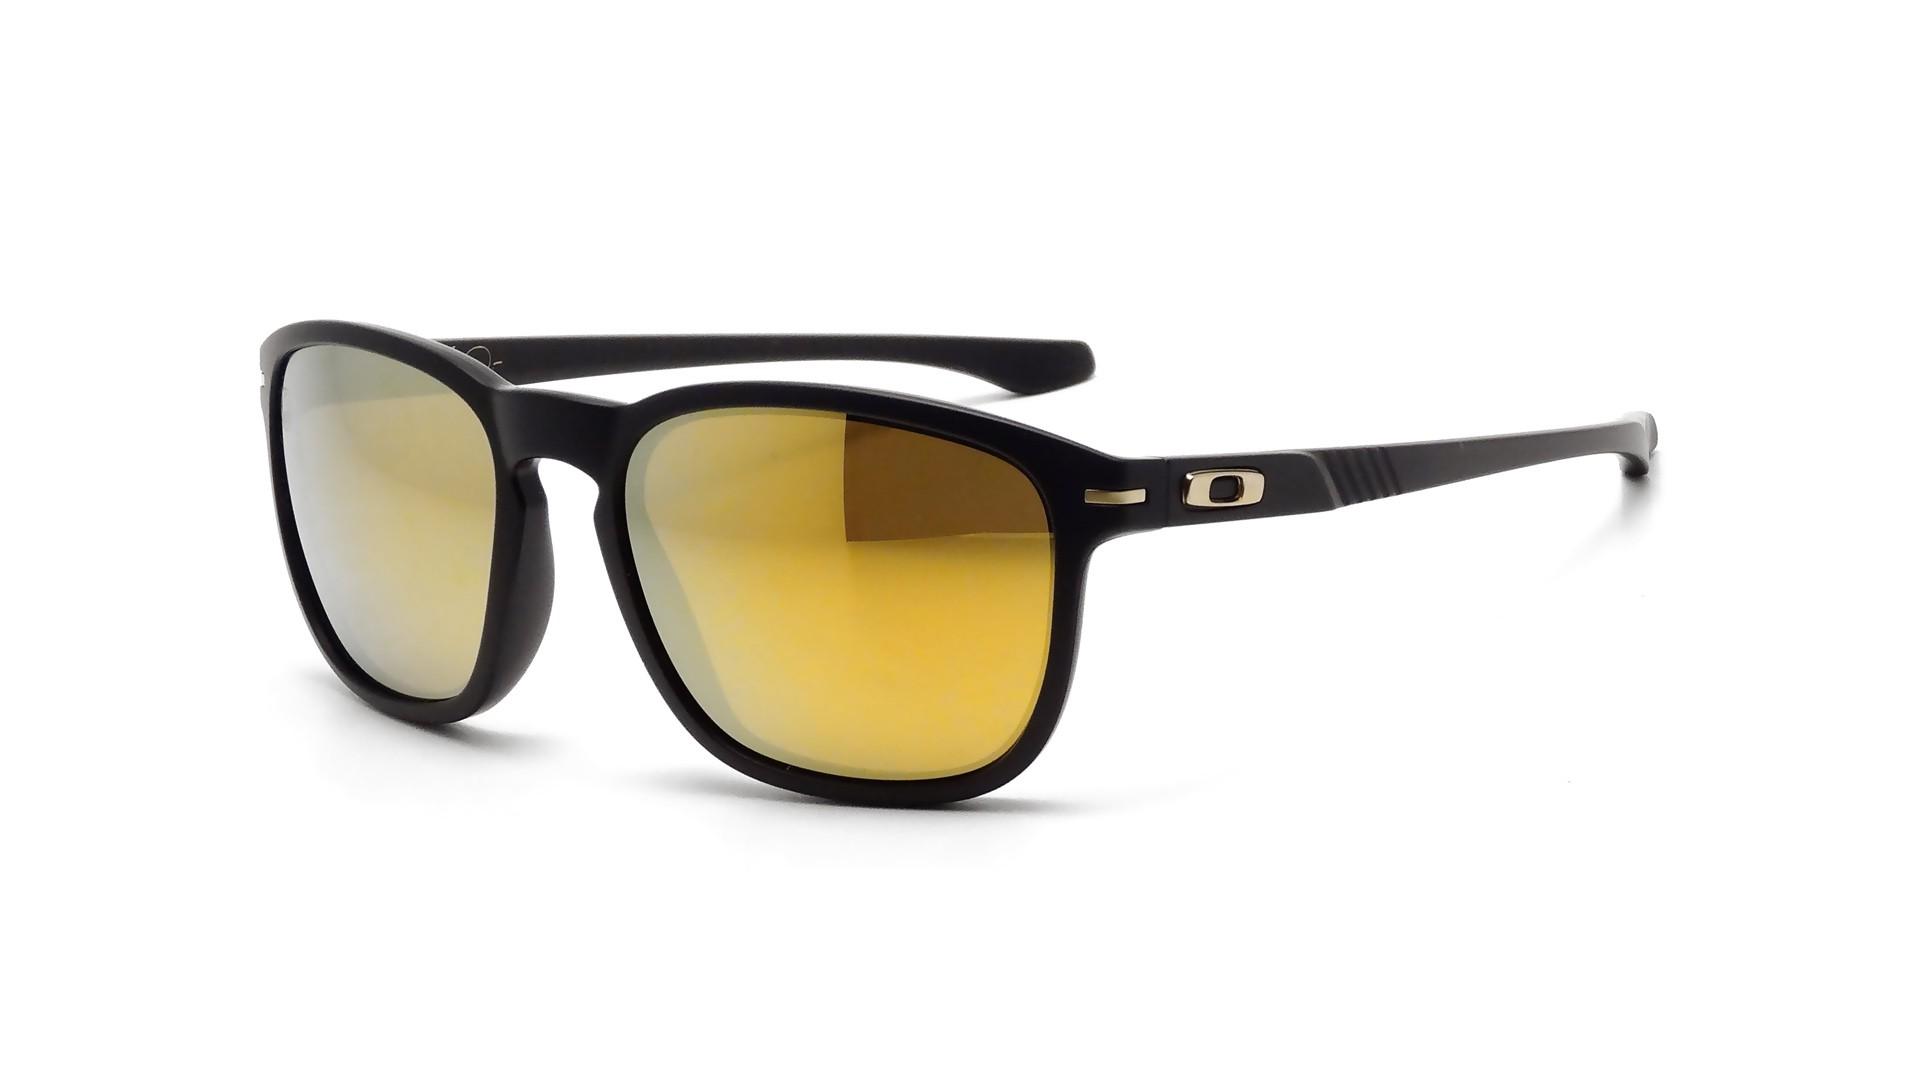 e2be76637df4cd Oakley Enduro Sunglasses Matte Black   24K Gold Iridium Lenses ...